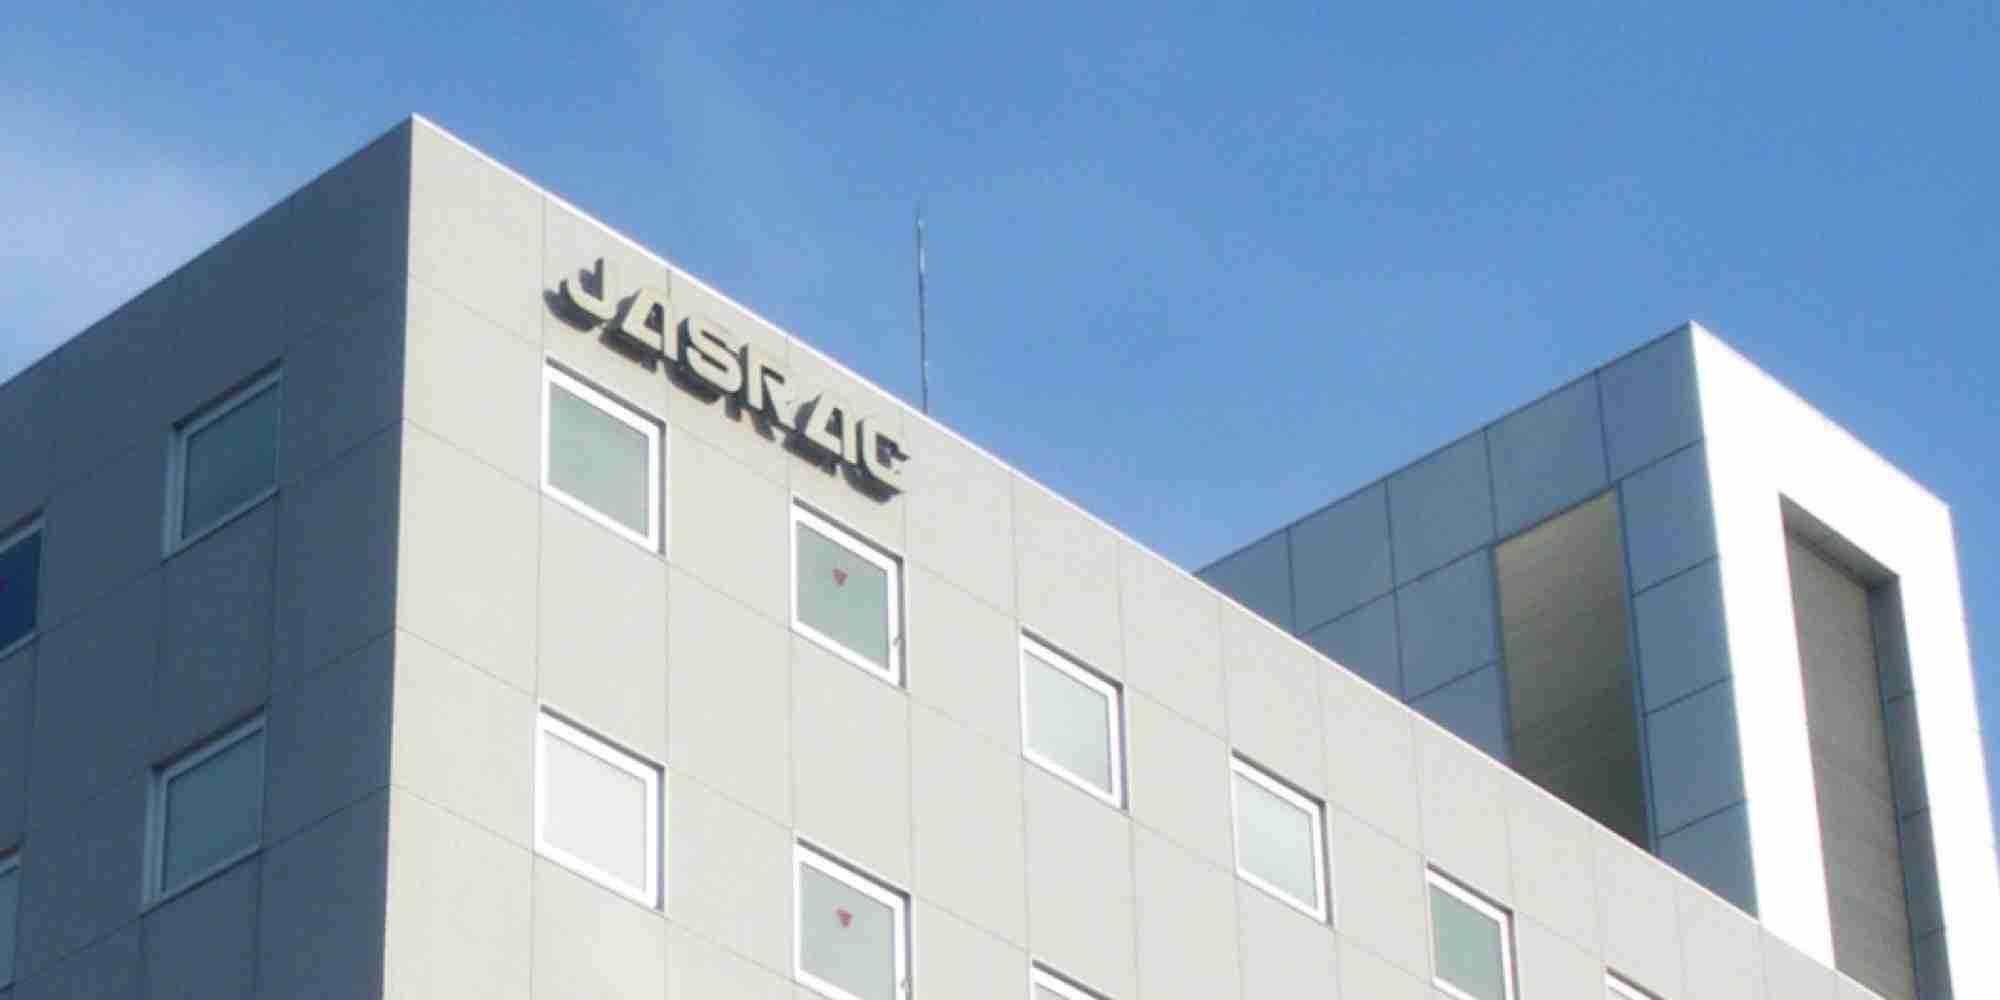 音楽教室側、JASRAC集団訴訟へ 200社超参加か